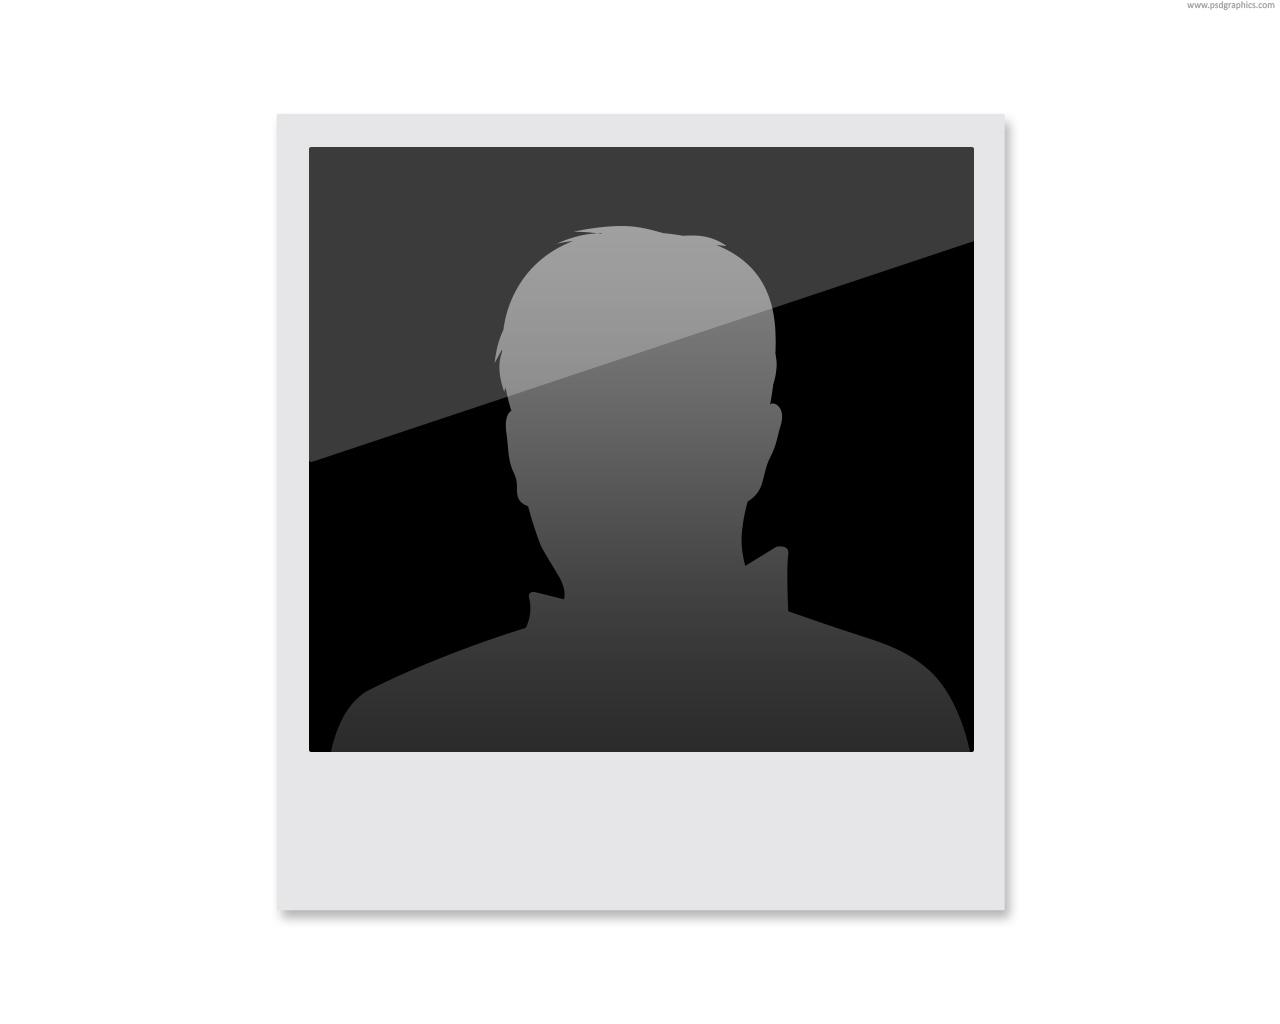 Full size jpg preview polaroid photo avatar